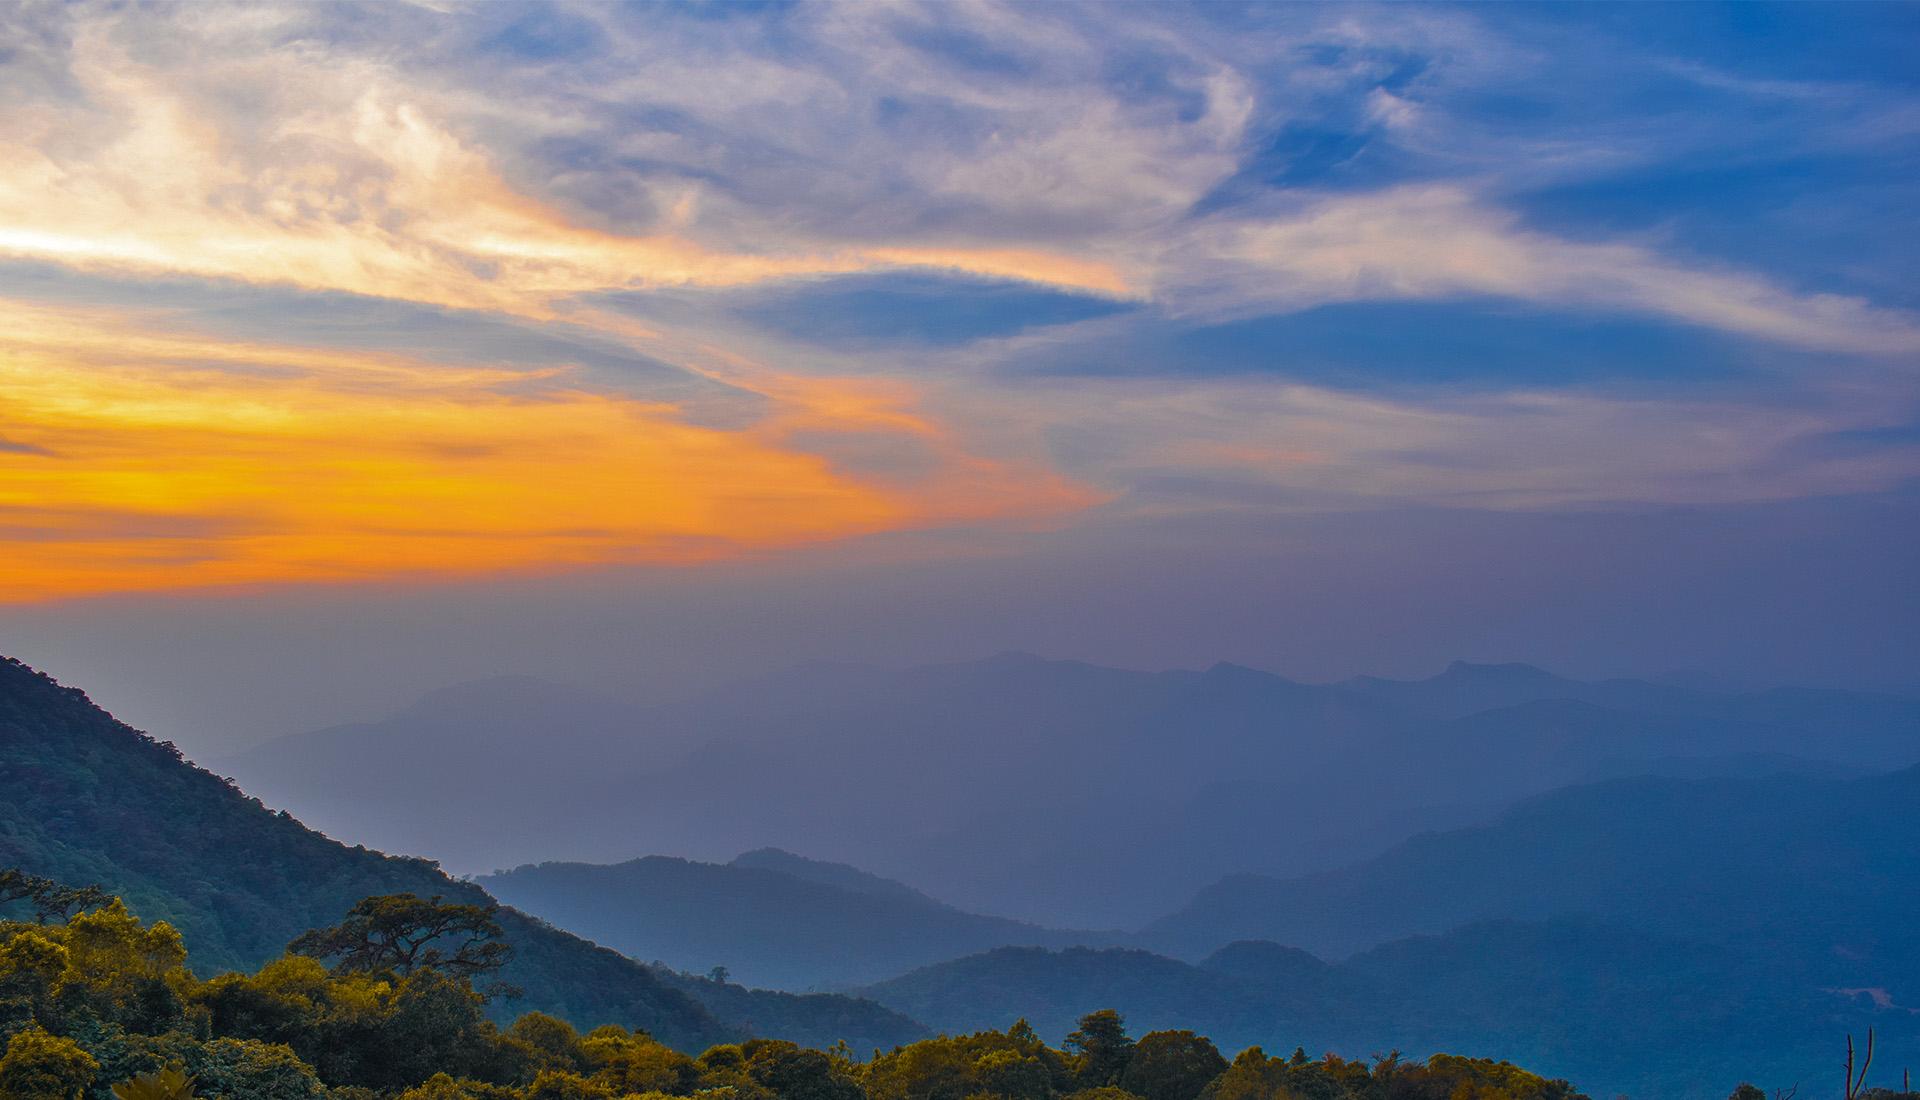 whats new banner karnataka tourism